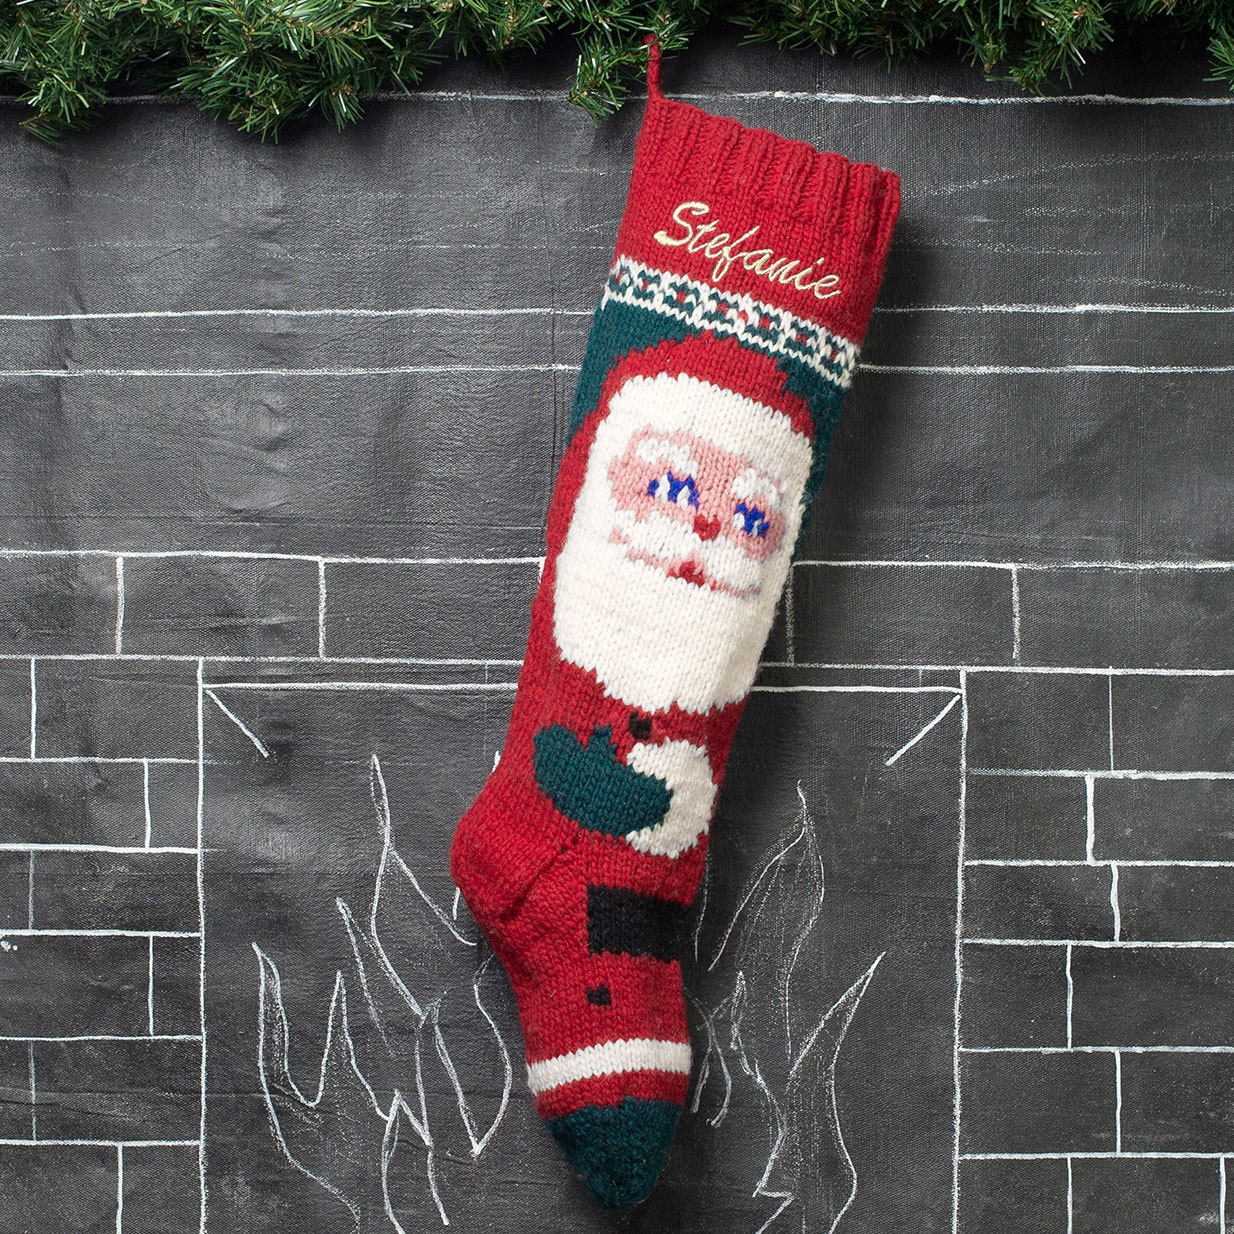 Personalized Knit Christmas Stocking / Kris Kringle Santa